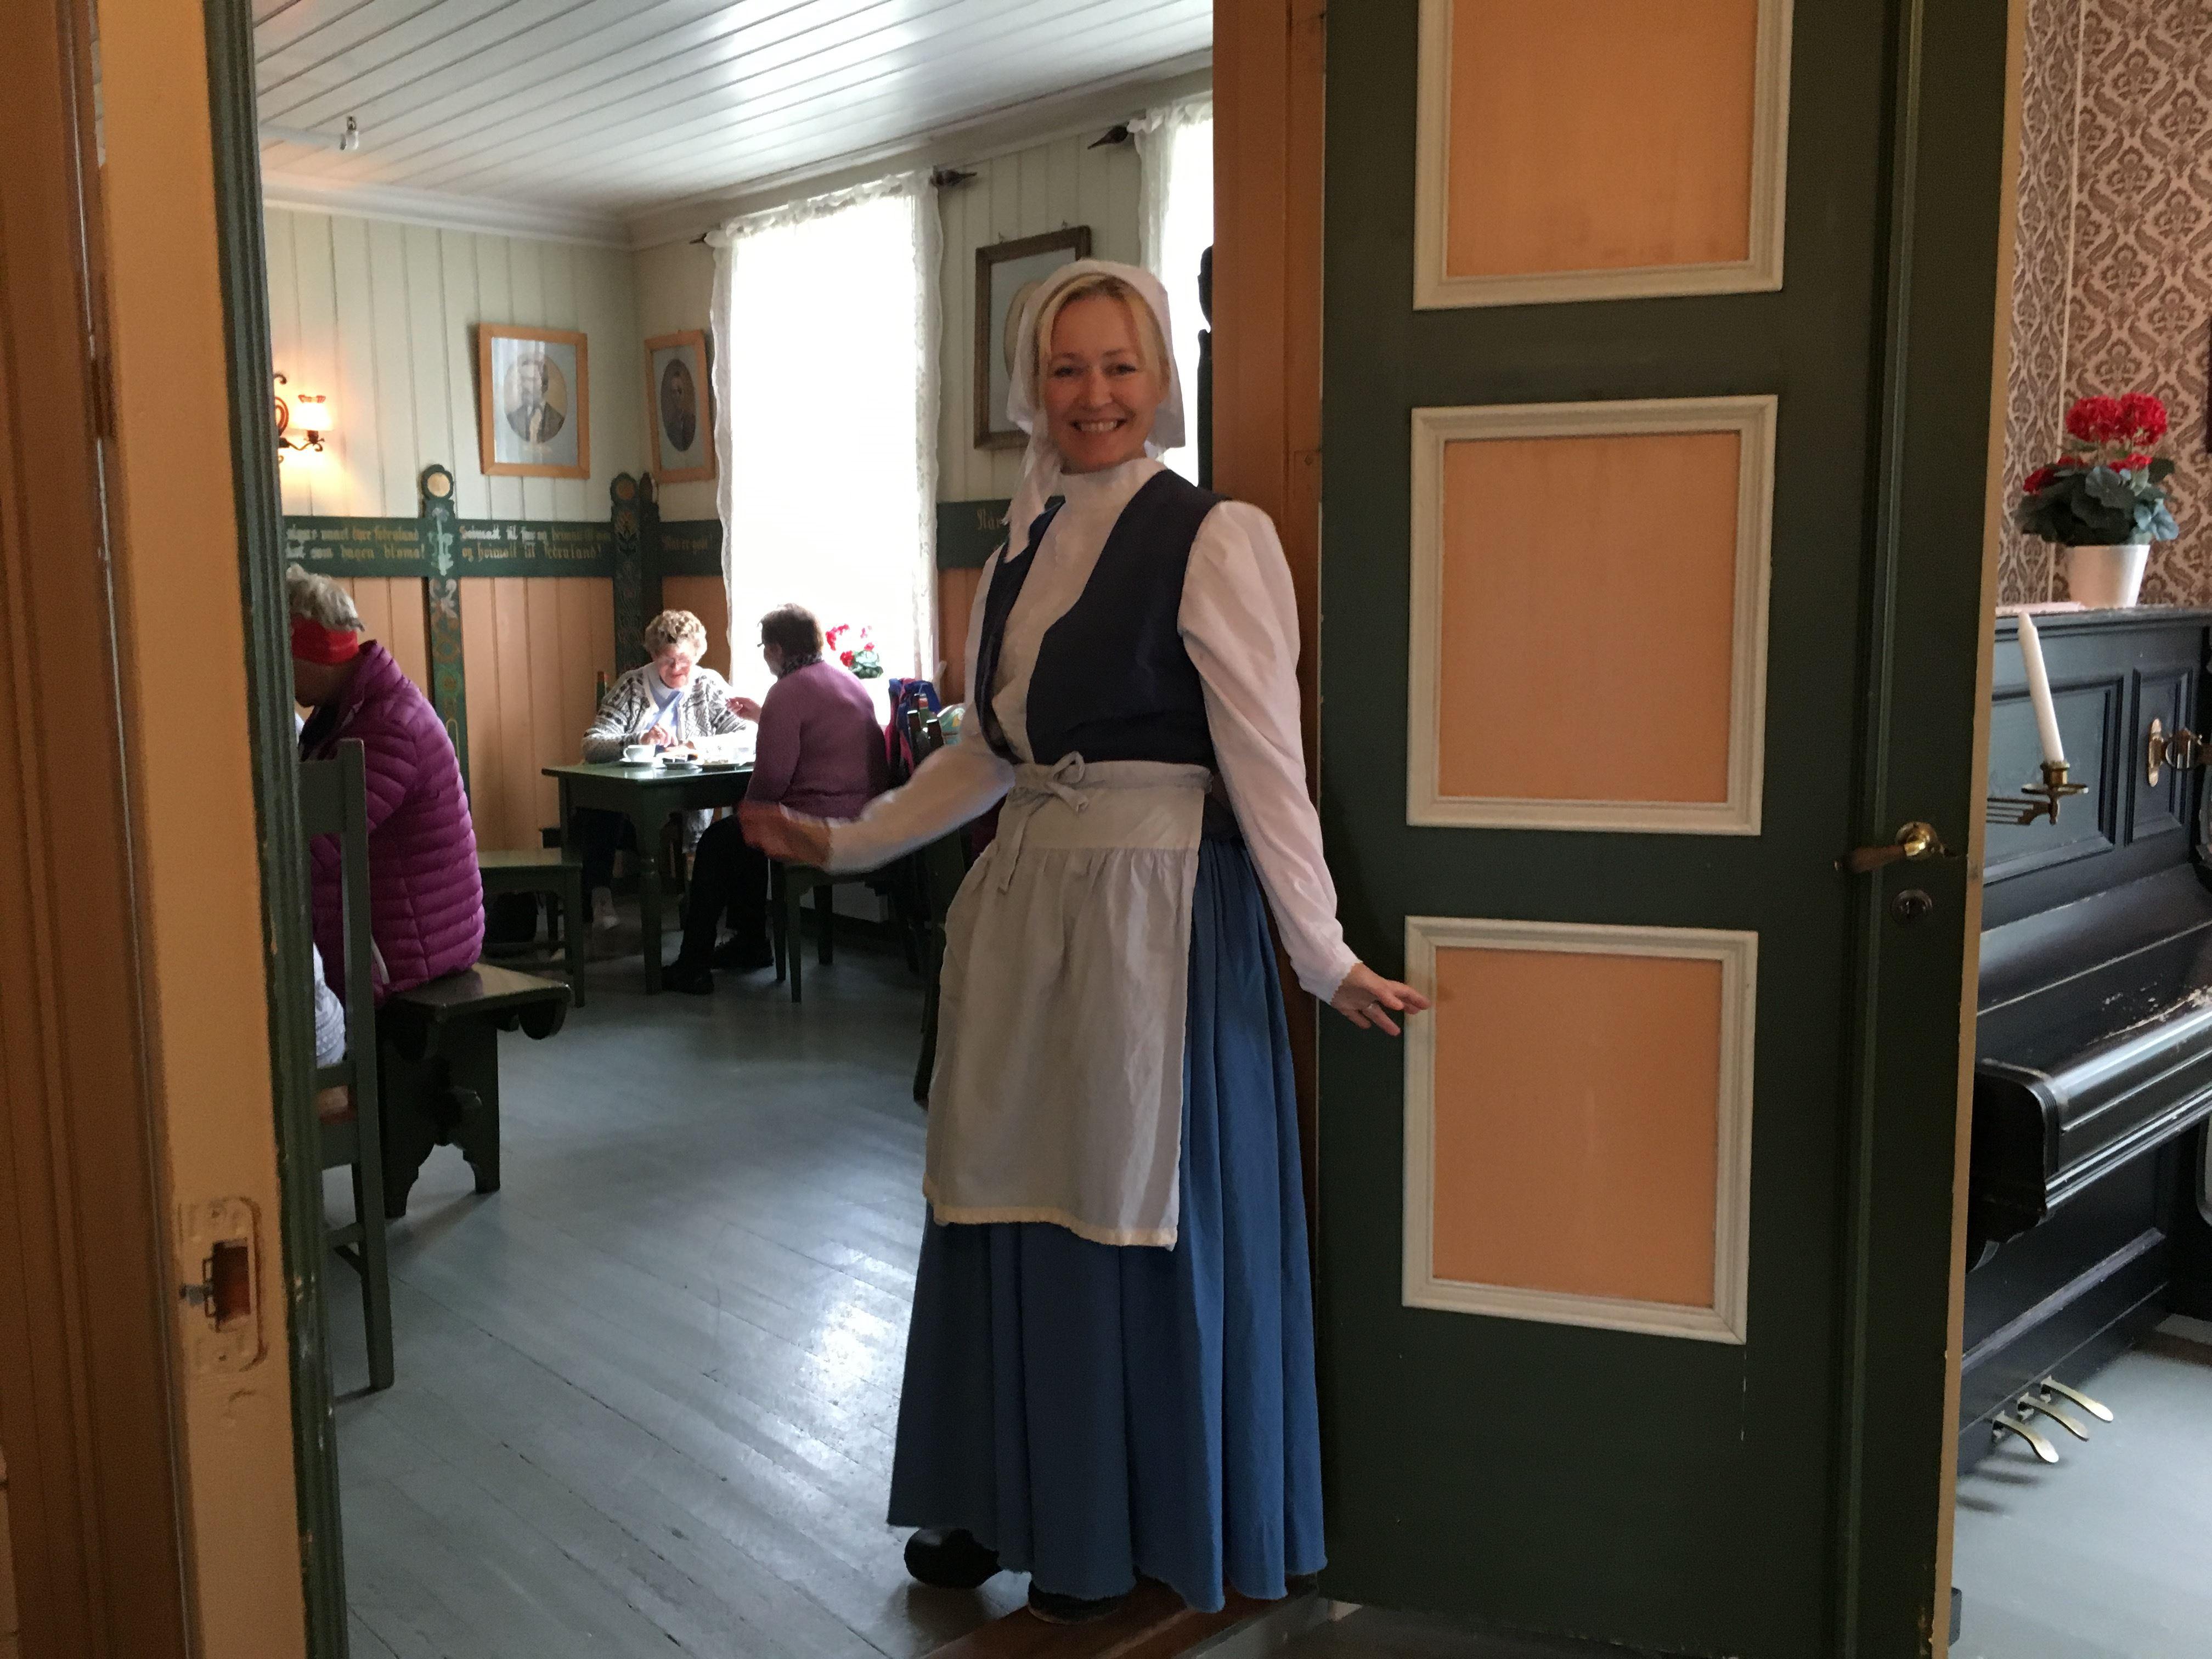 Pernille Olsdatter Buøy tar deg med på en rundtur i Kystmuseet Rørvik sine bygg i Rørvik